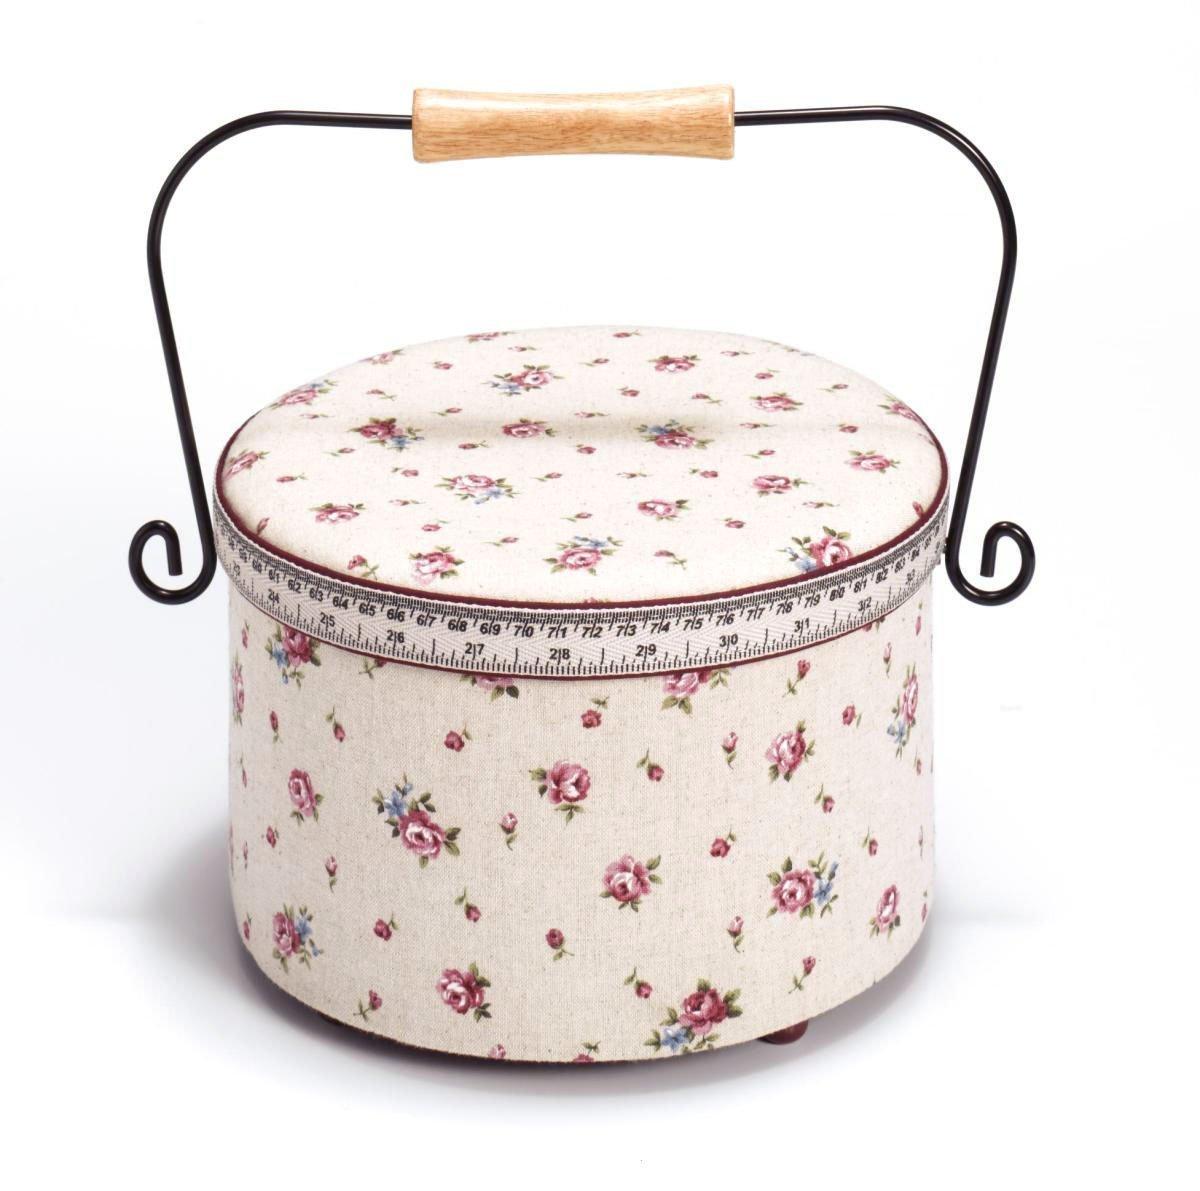 Prym Delicate Country Rose Print Tape Measure and Trim Sewing Basket with Handle, Linen/Metal/Wood, Ivory, Medium PRYM_612140-1